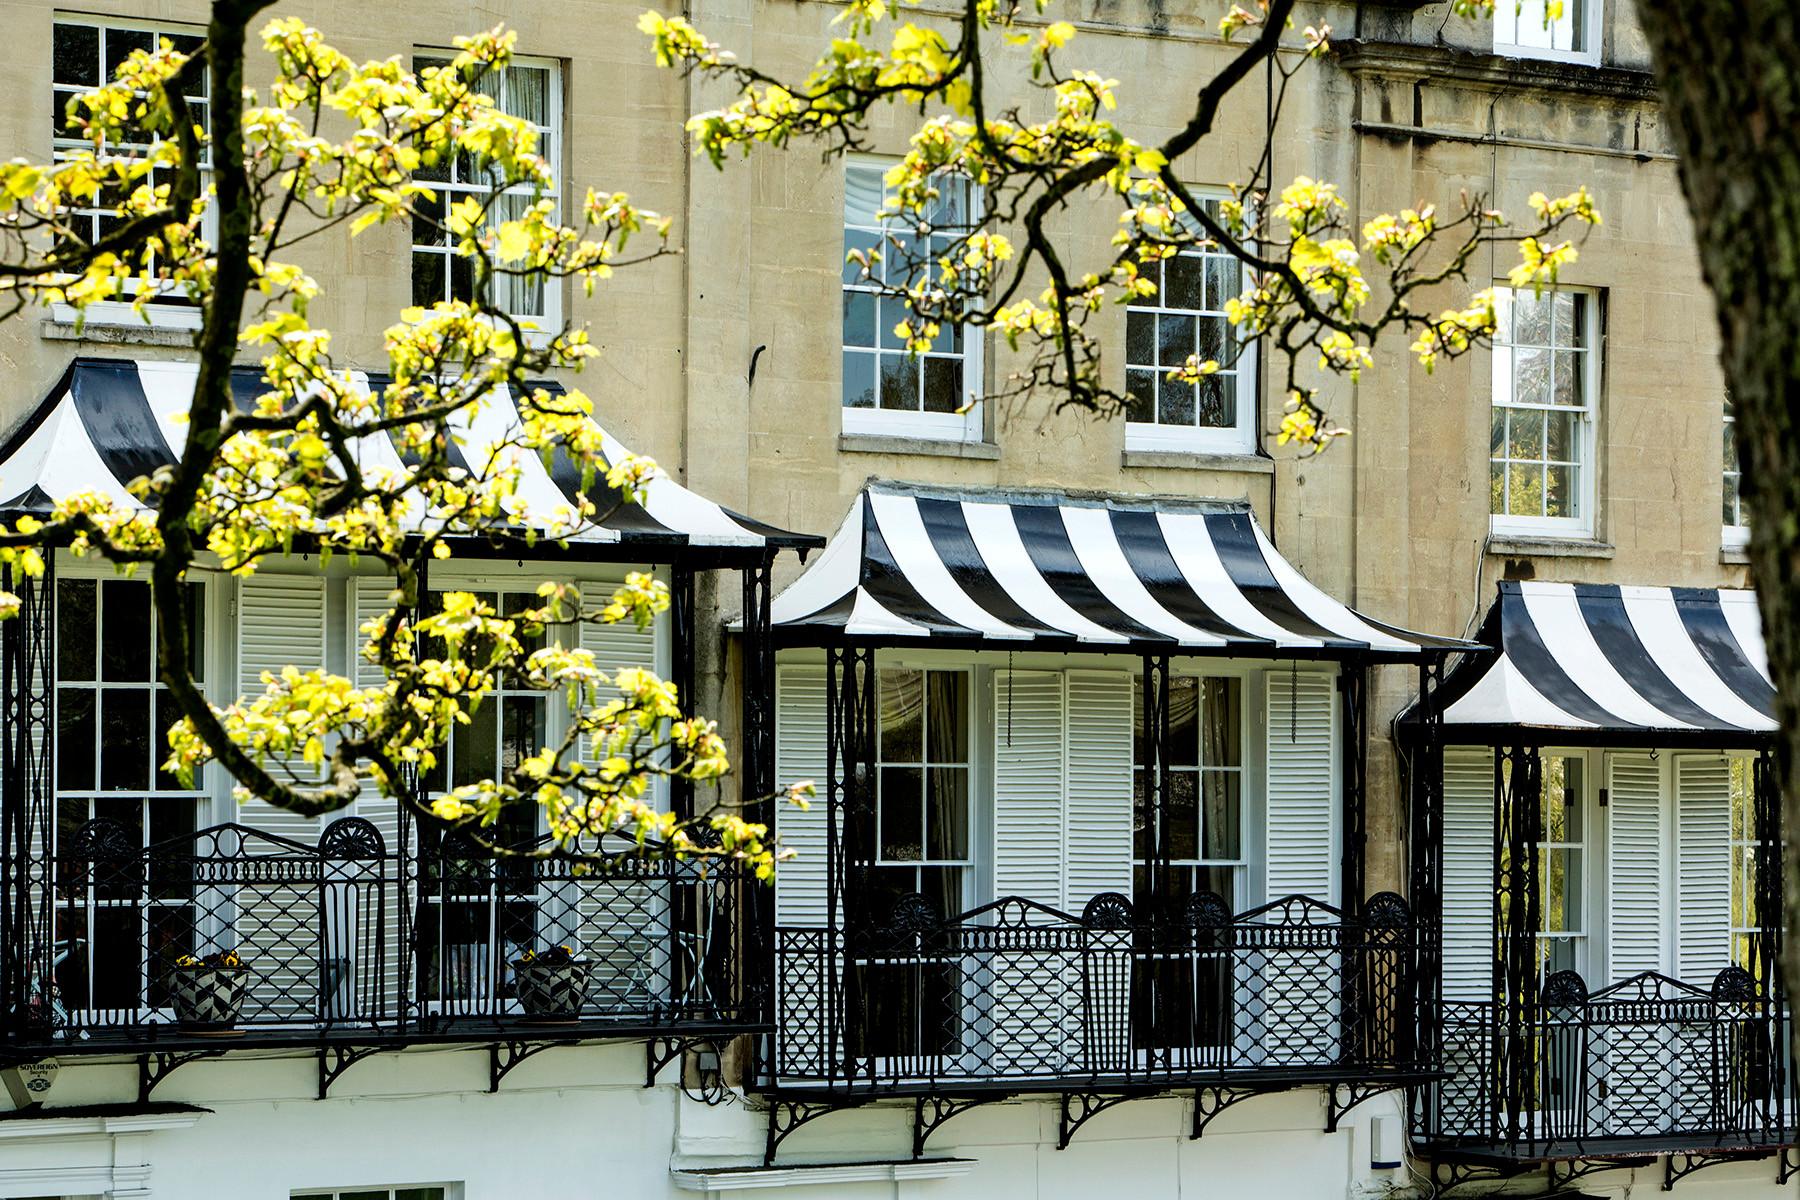 Houses, Clifton Village, Bristol